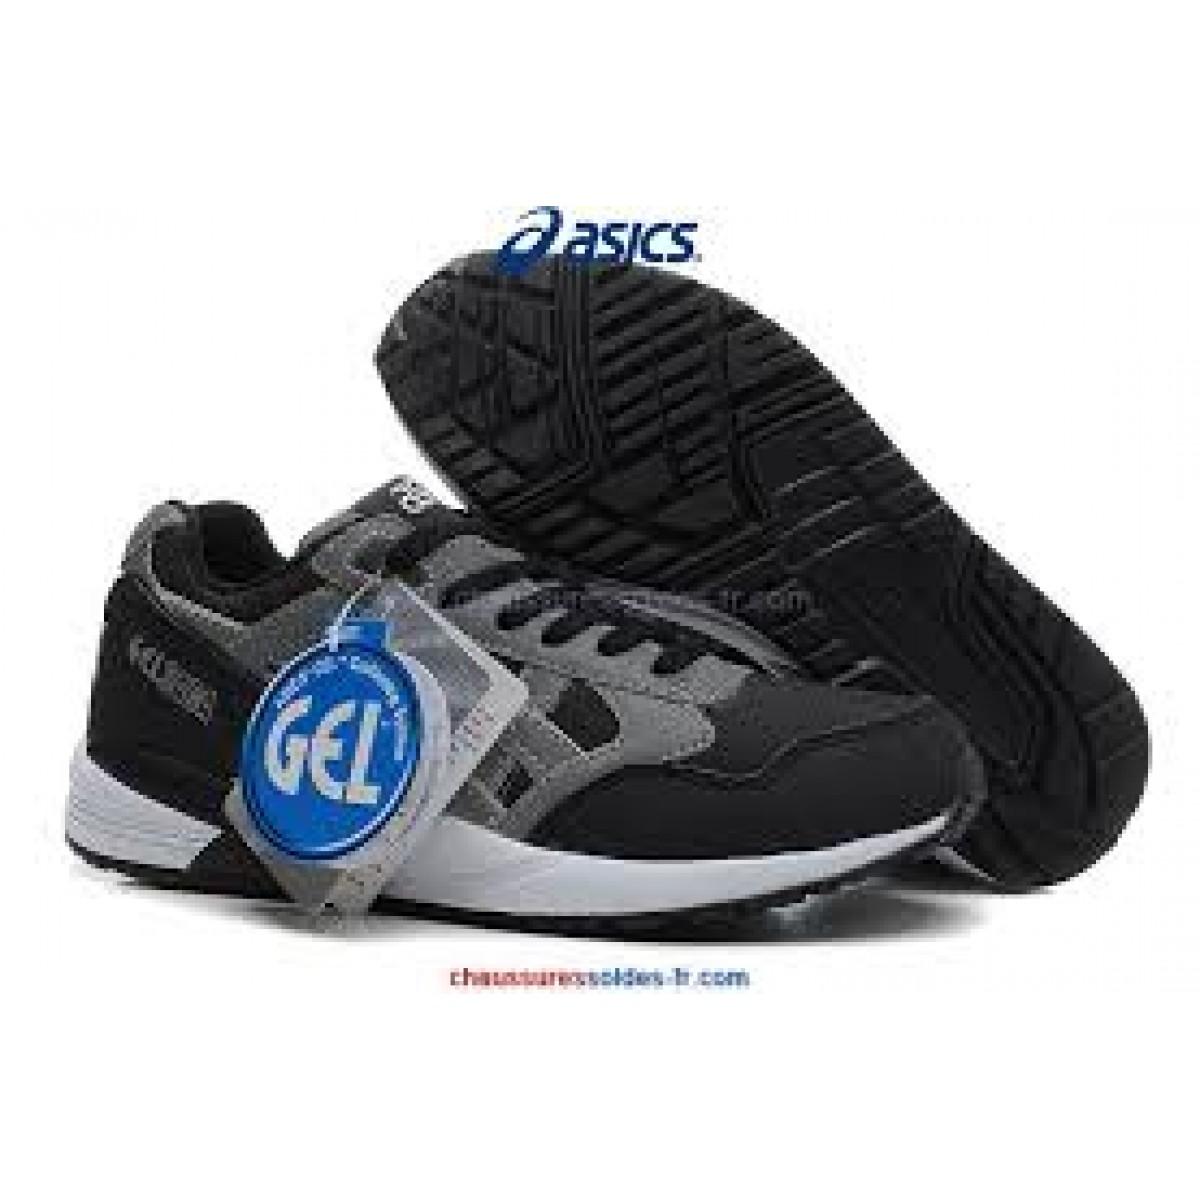 acheter chaussures asics pas cher